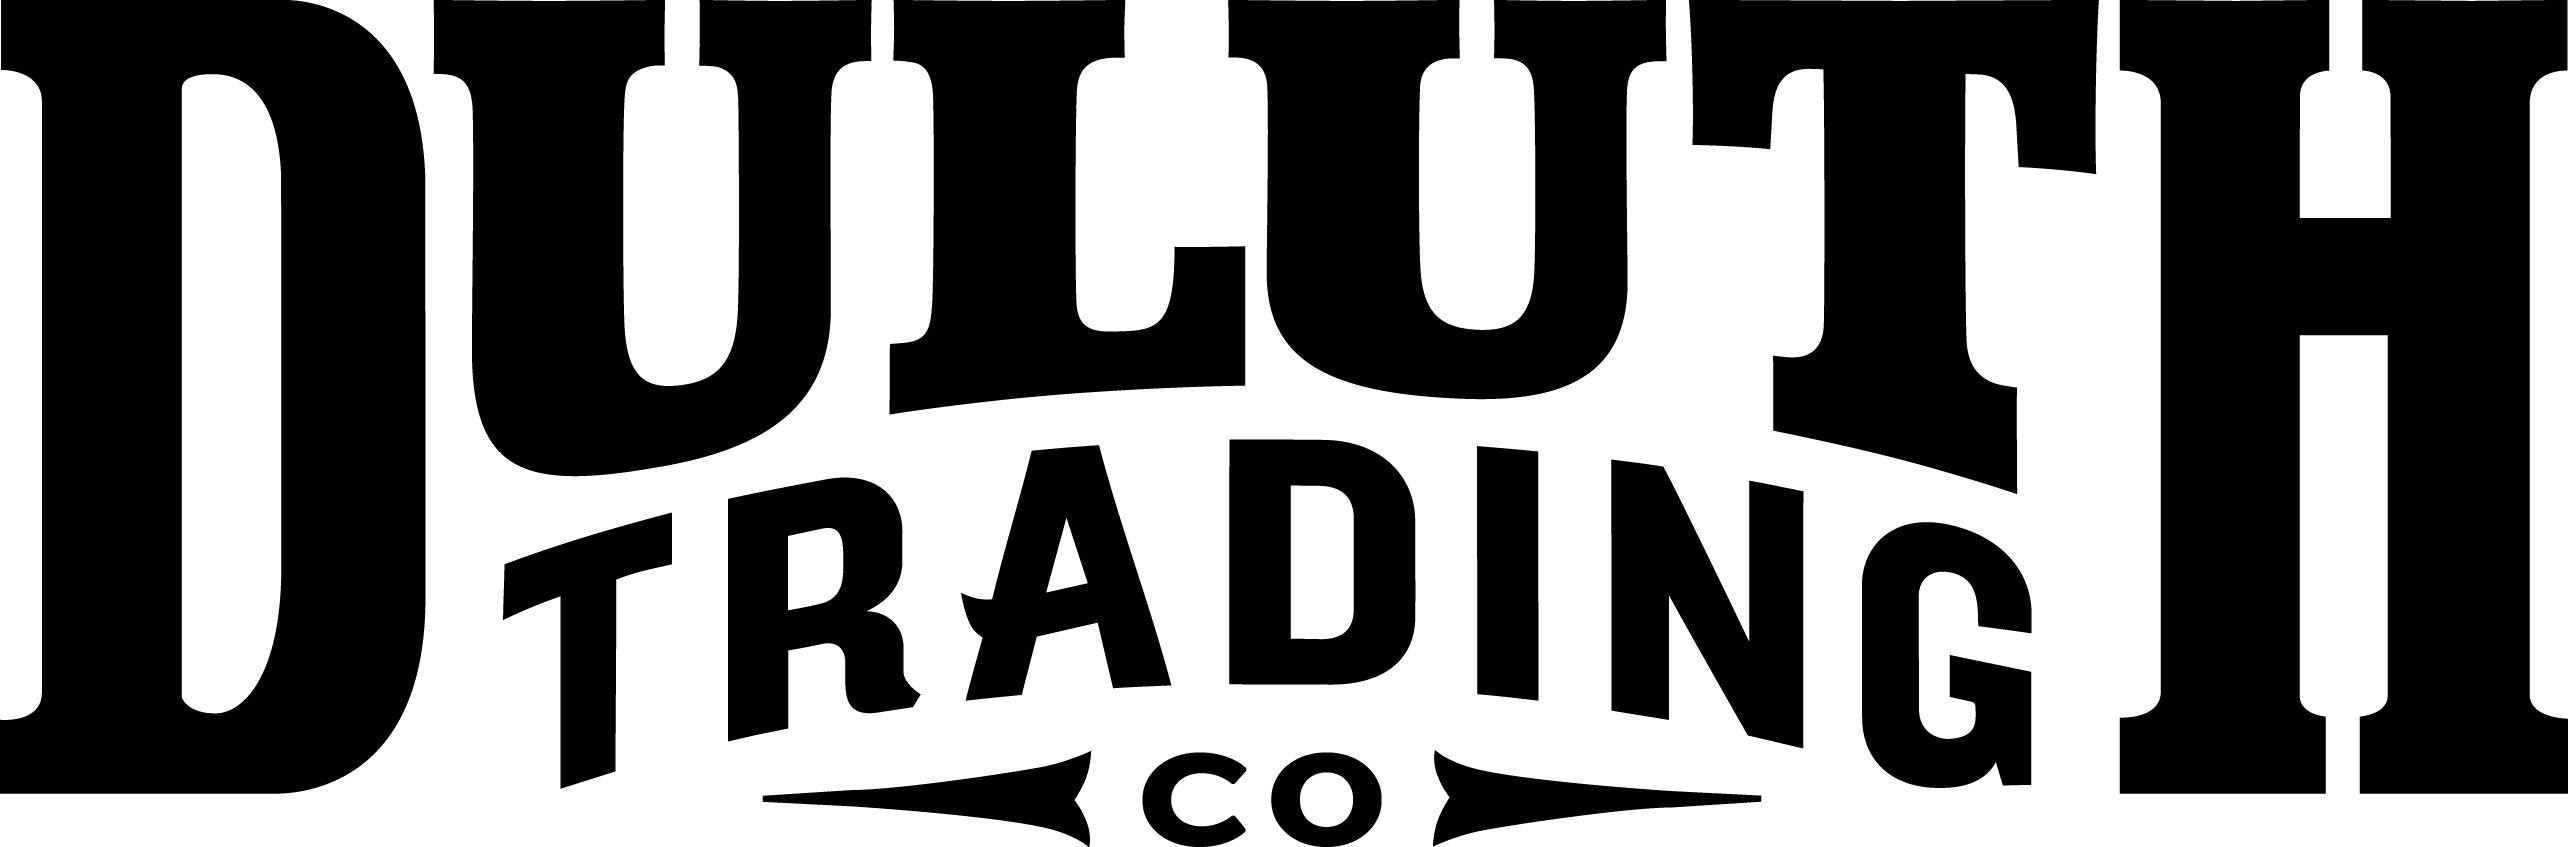 logo-duluth_trading